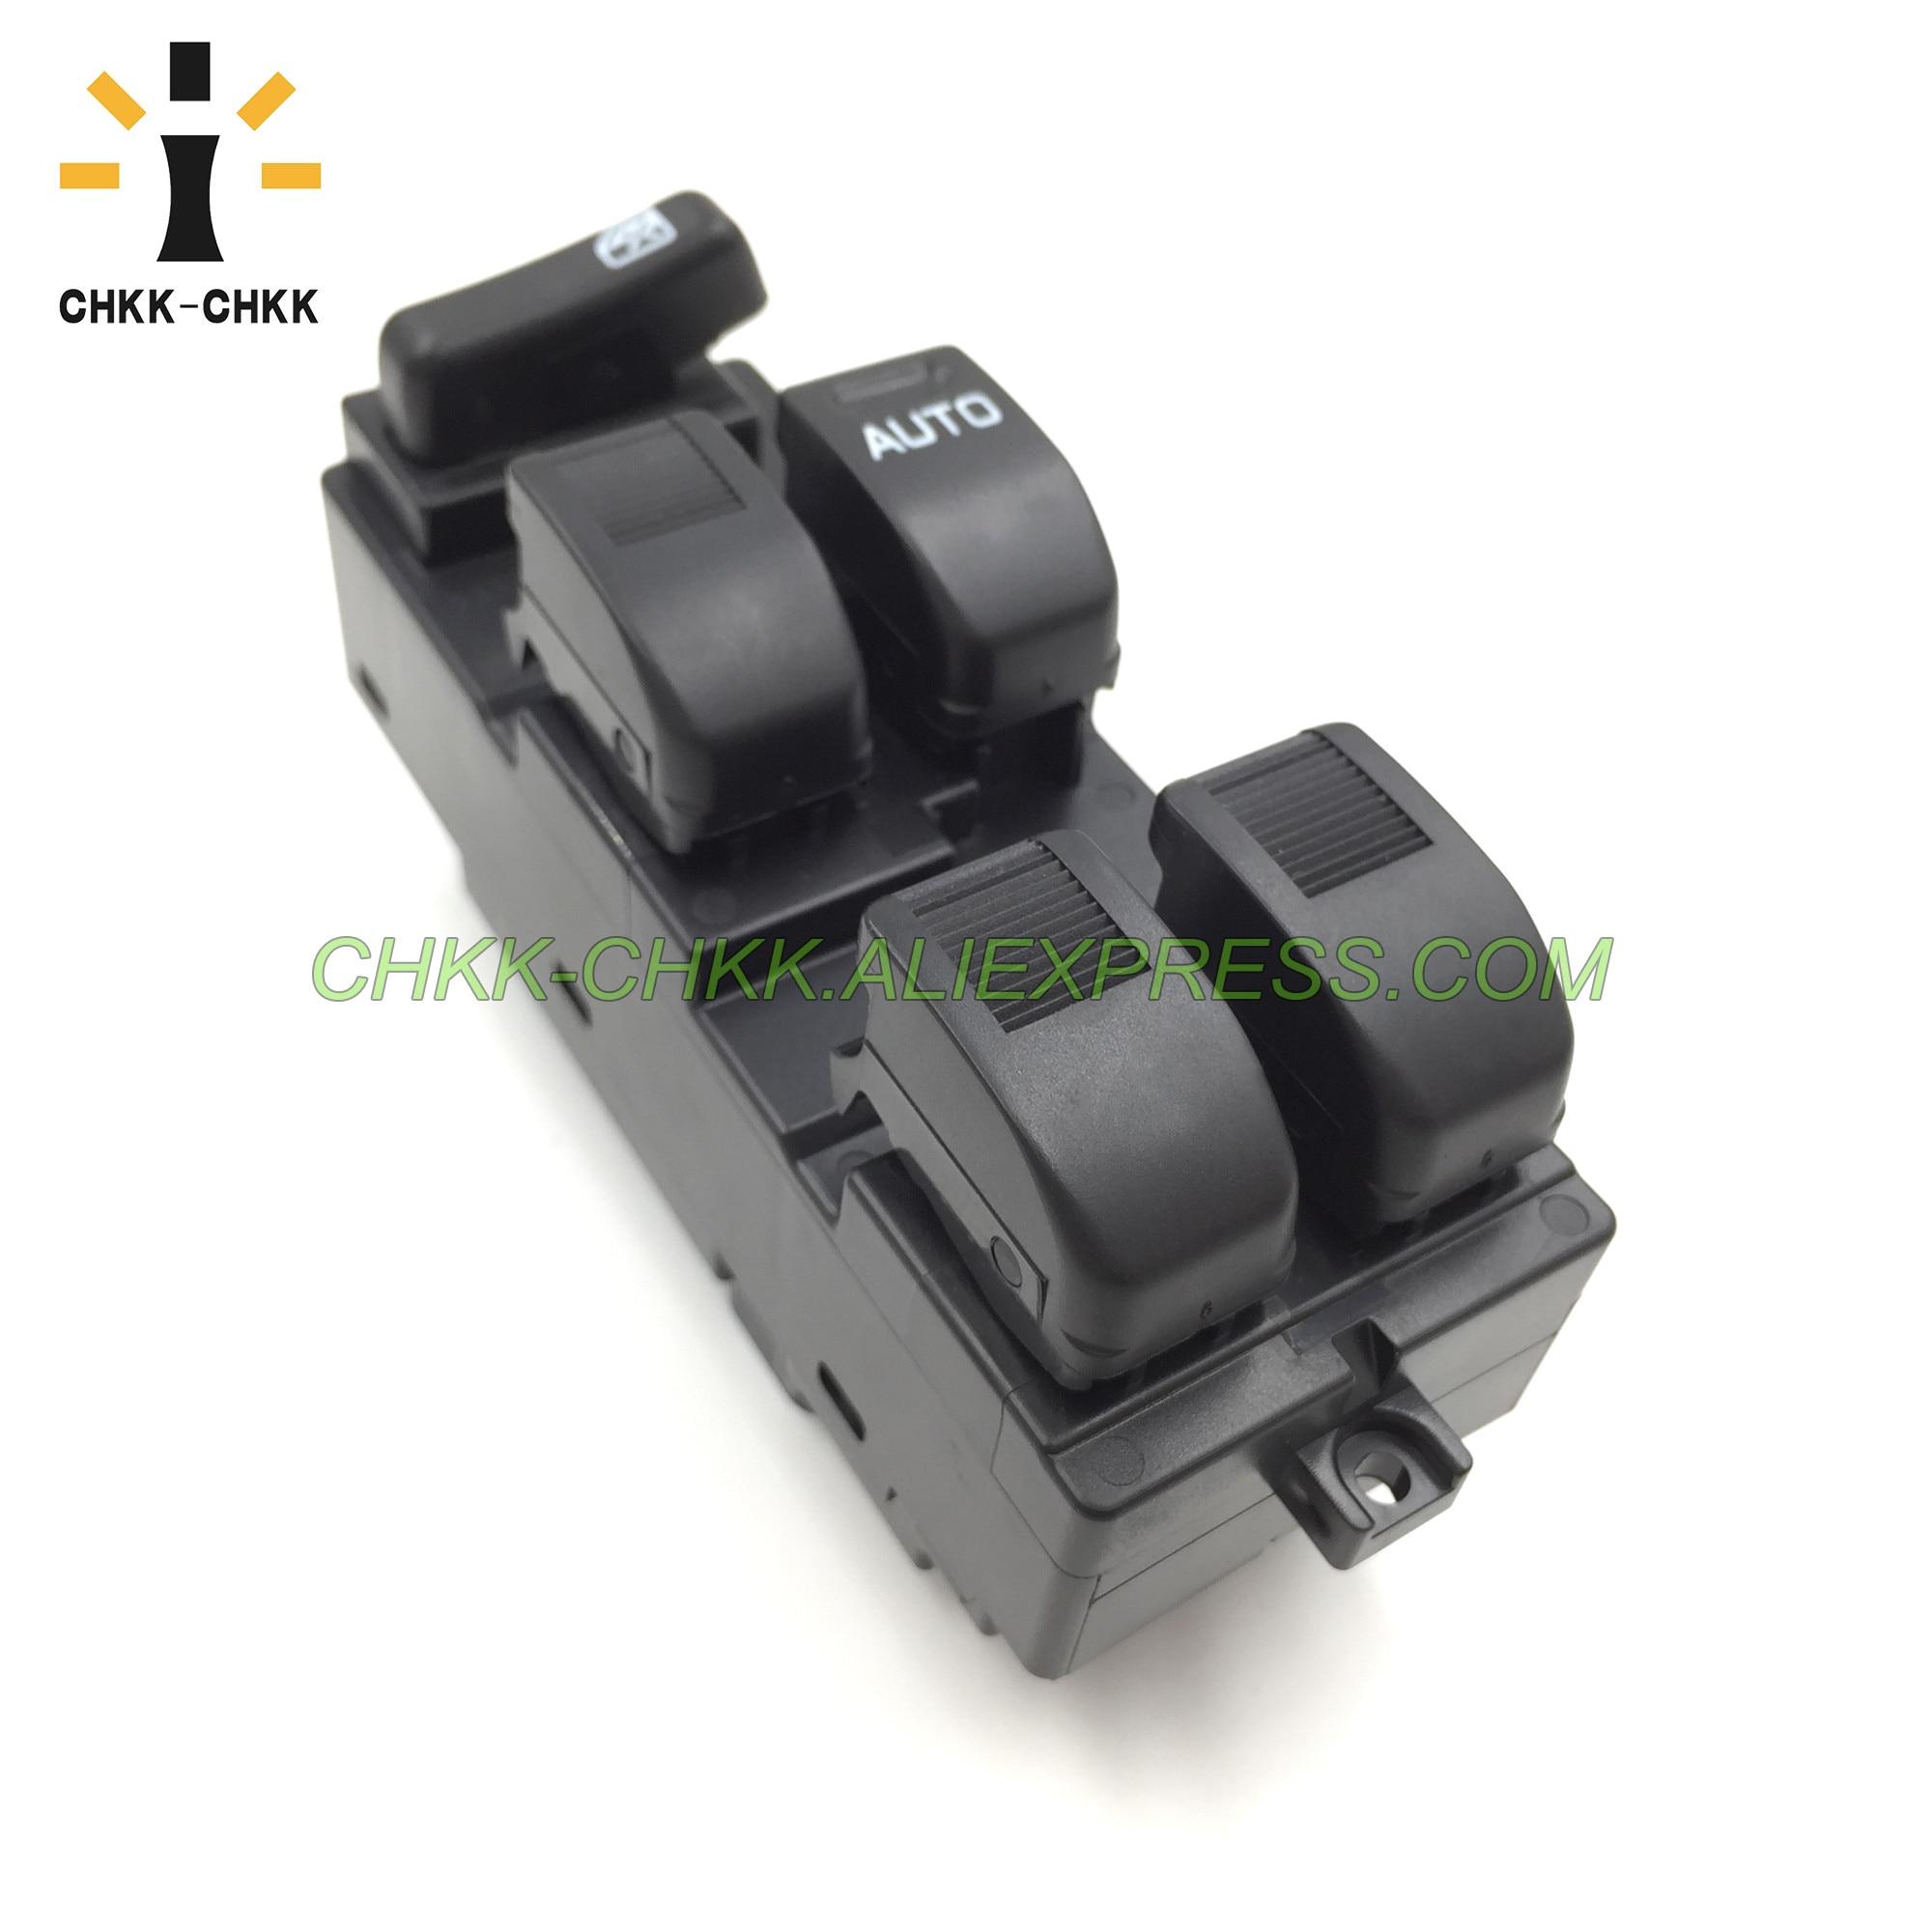 CHKK-CHKK 84820-B0010 Master Power Window Switch for Toyota Avanza F601 F602 03-11 84820B0010